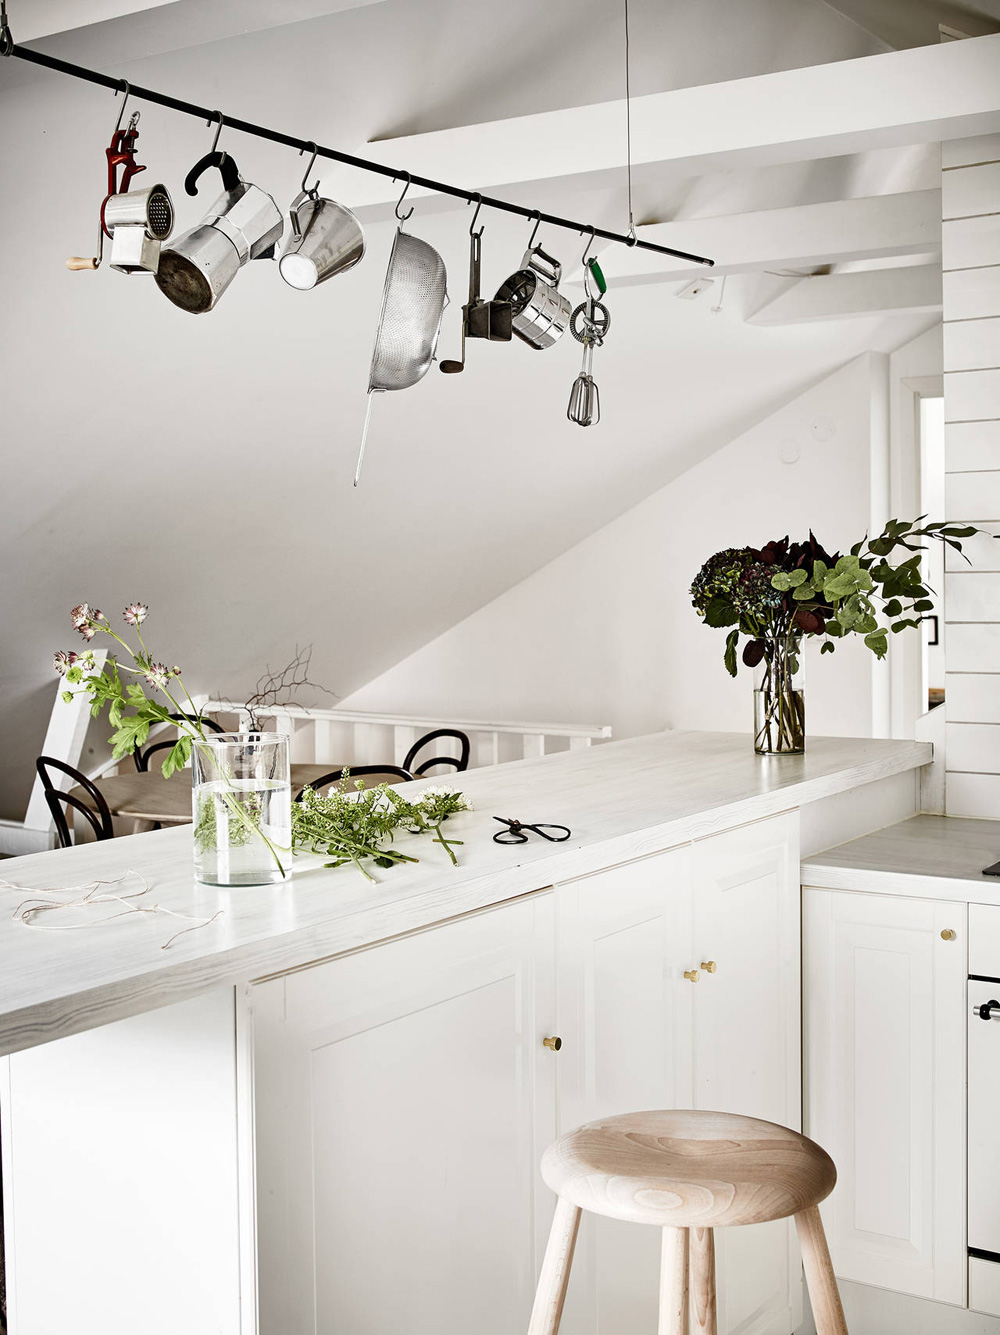 Oracle Fox, Sunday Sanctuary, Elsewhere, Small Apartment, living, Alternative Scandinvian, Interior, Artwork, Desk, Minimal, Kitchen, White, indoor plants